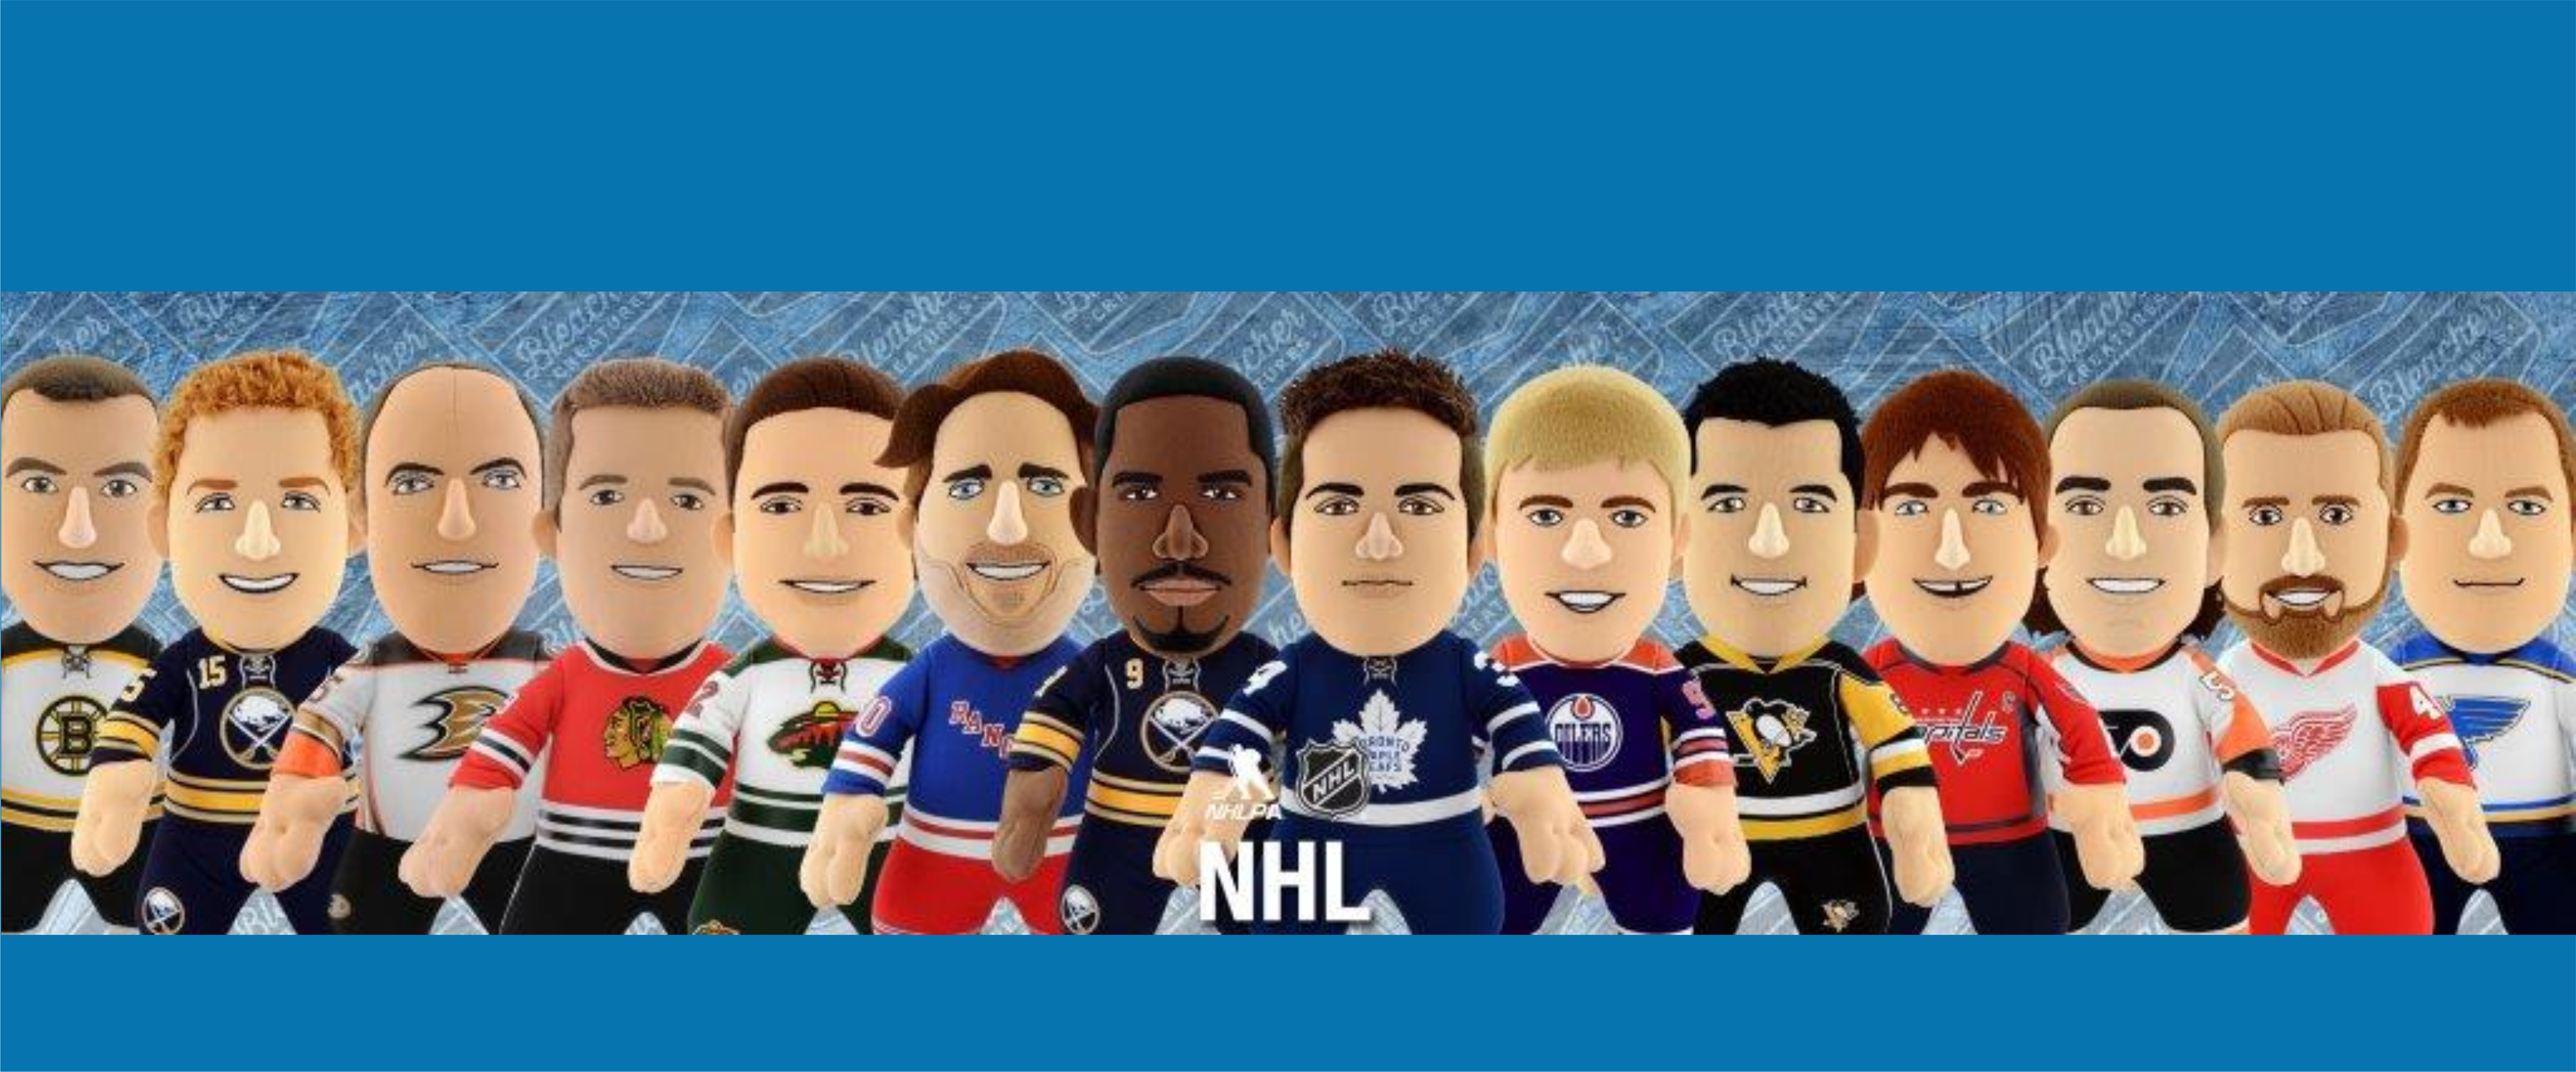 BLEACHER CREATURES NHL